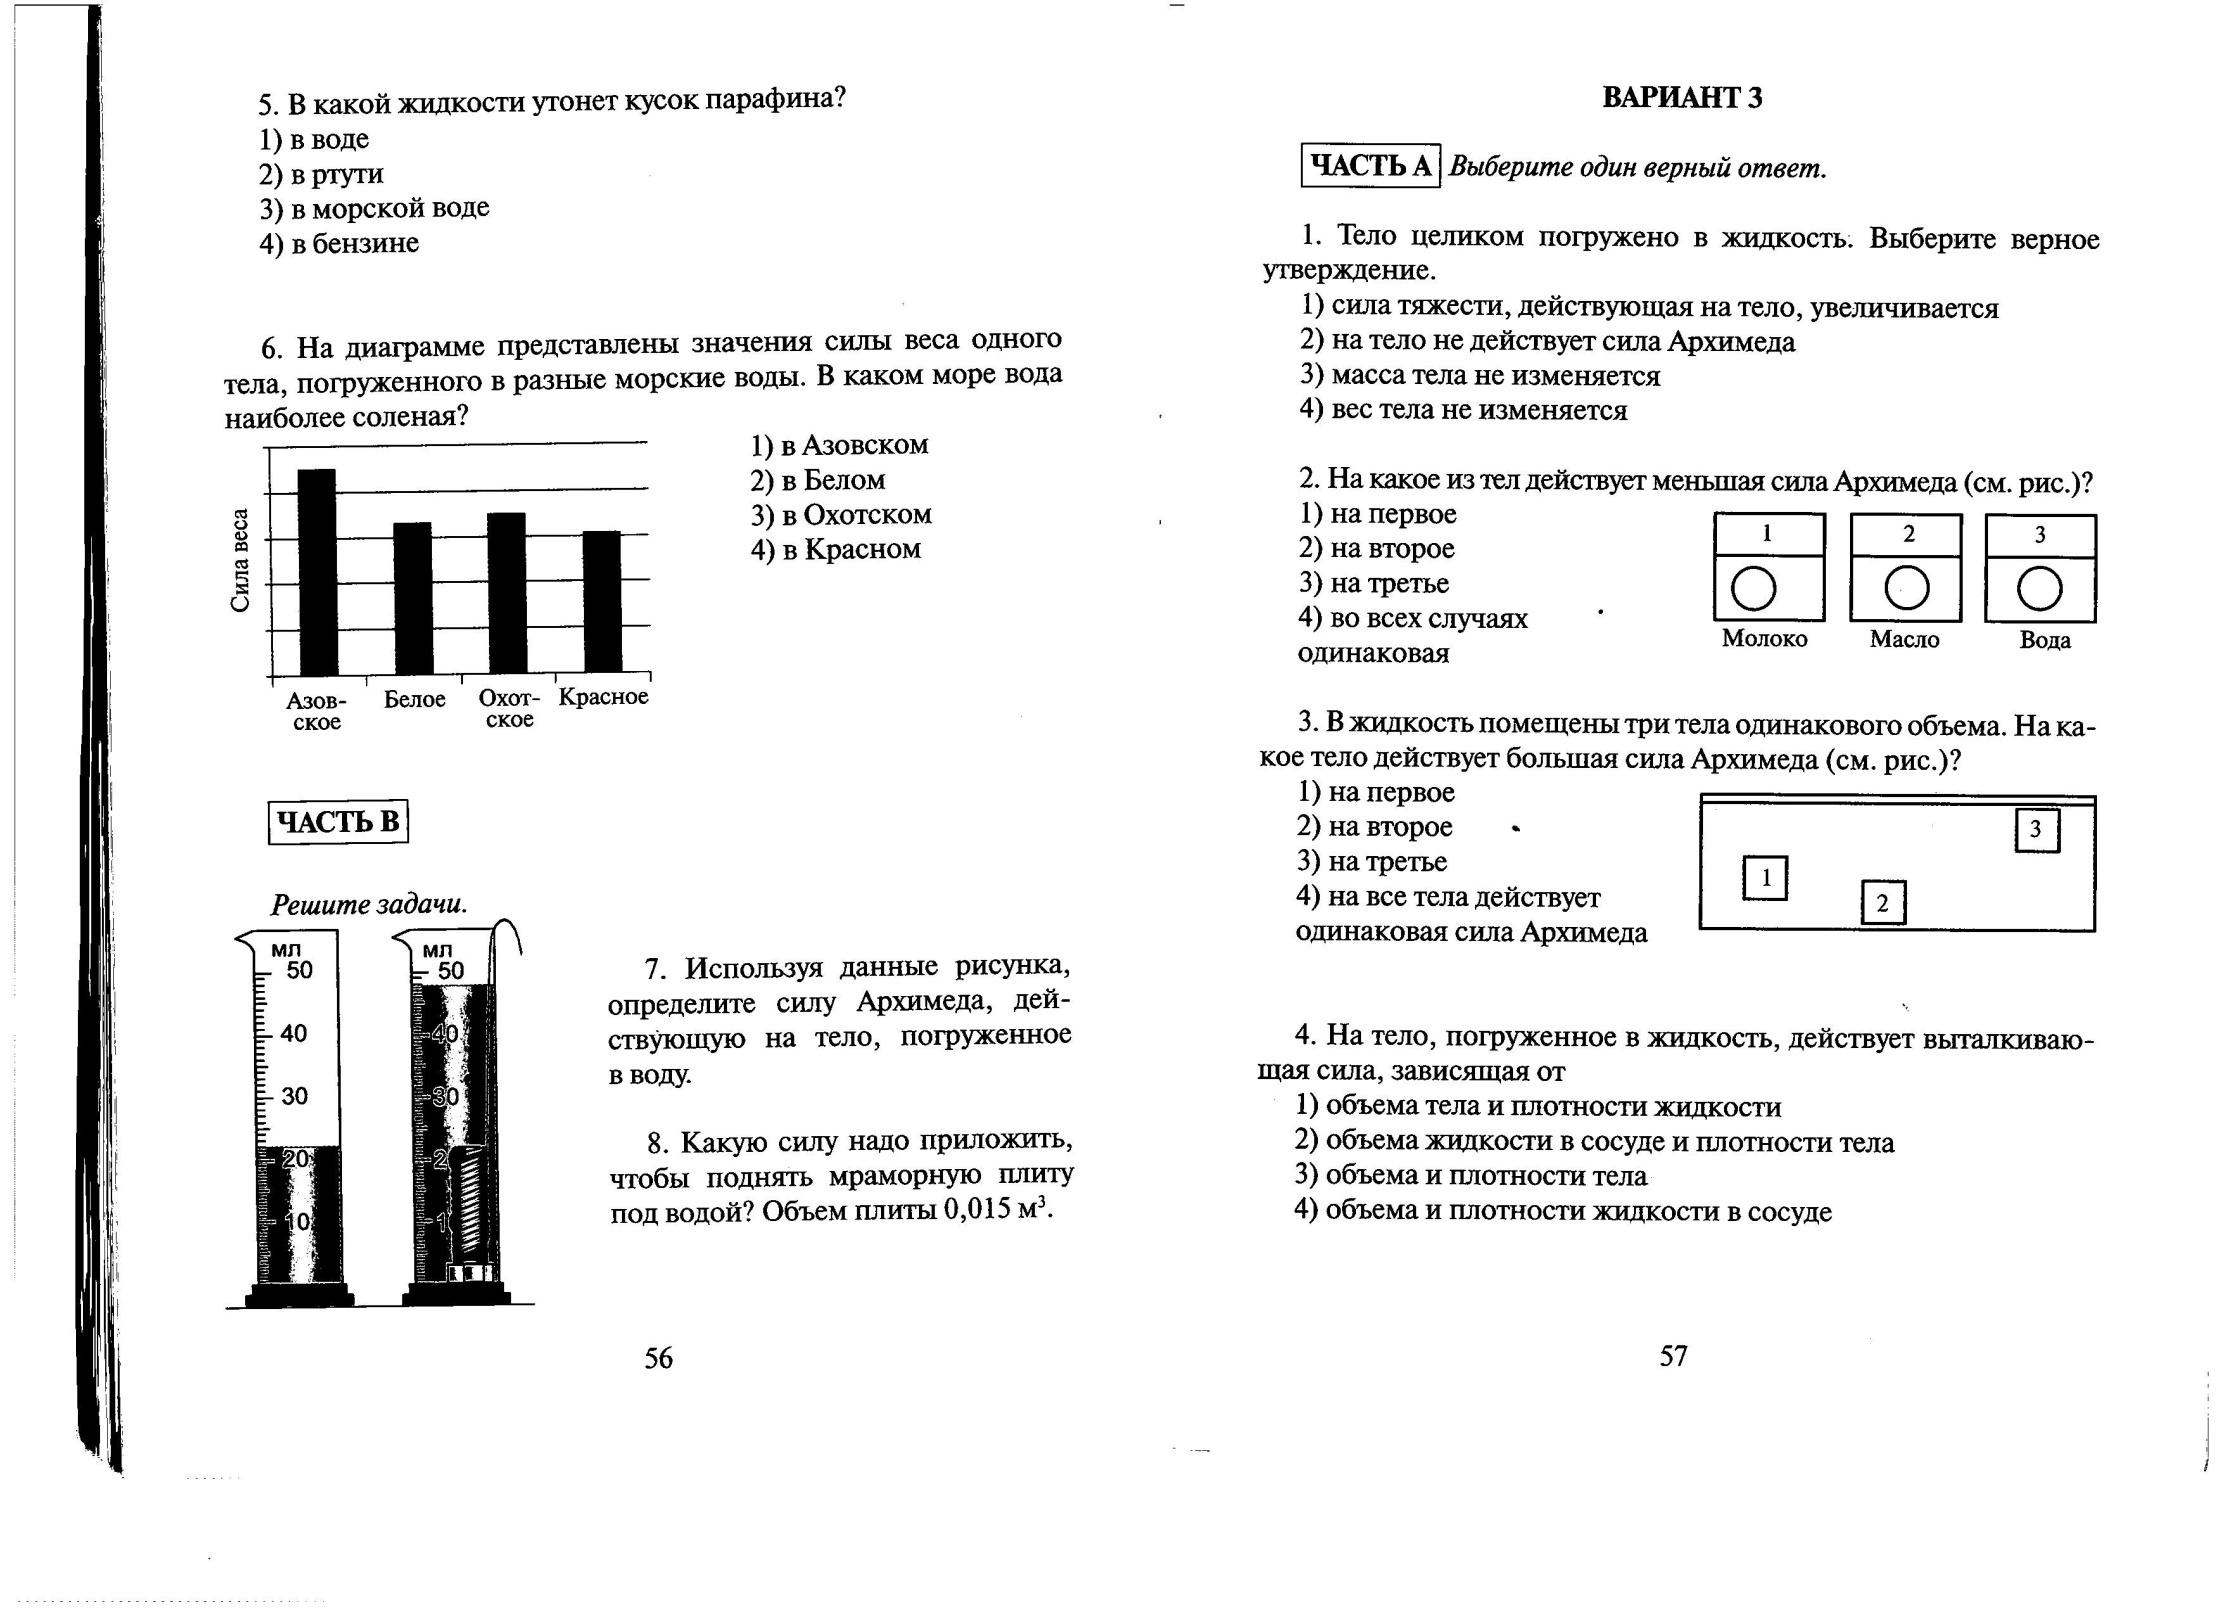 C:\Users\1\Desktop\физика 7 класс кр\24.jpeg